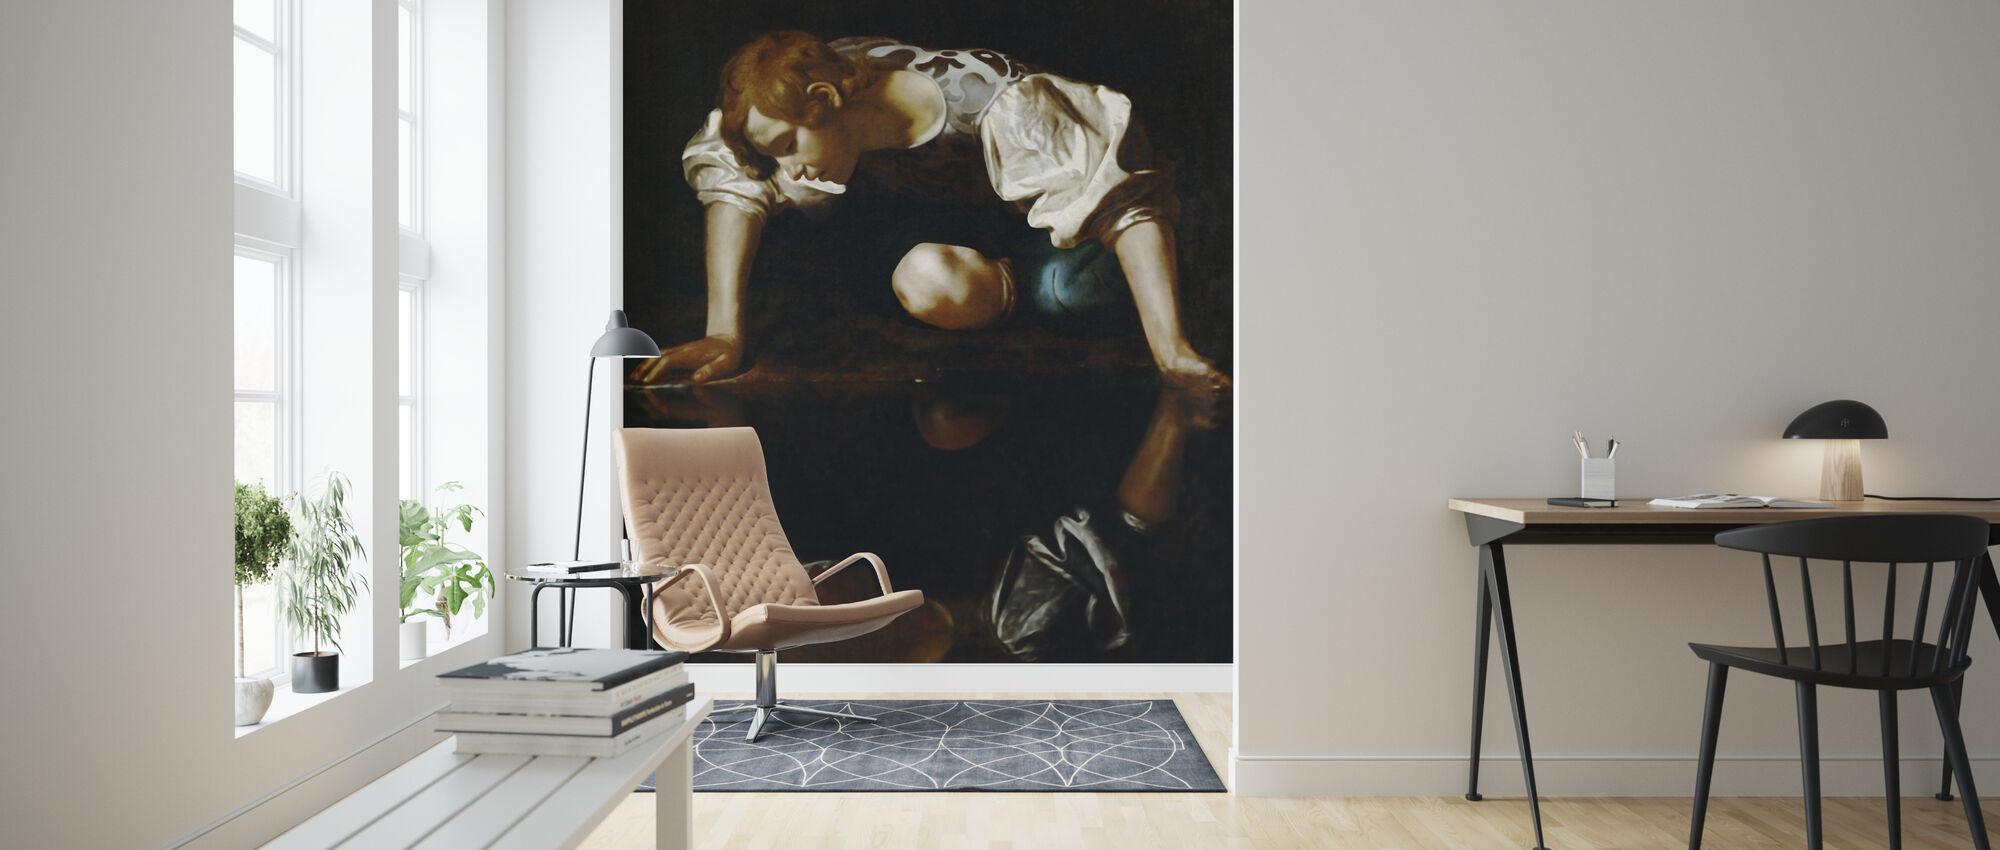 Narcissus, Michelangelo Merisi - Wallpaper - Living Room